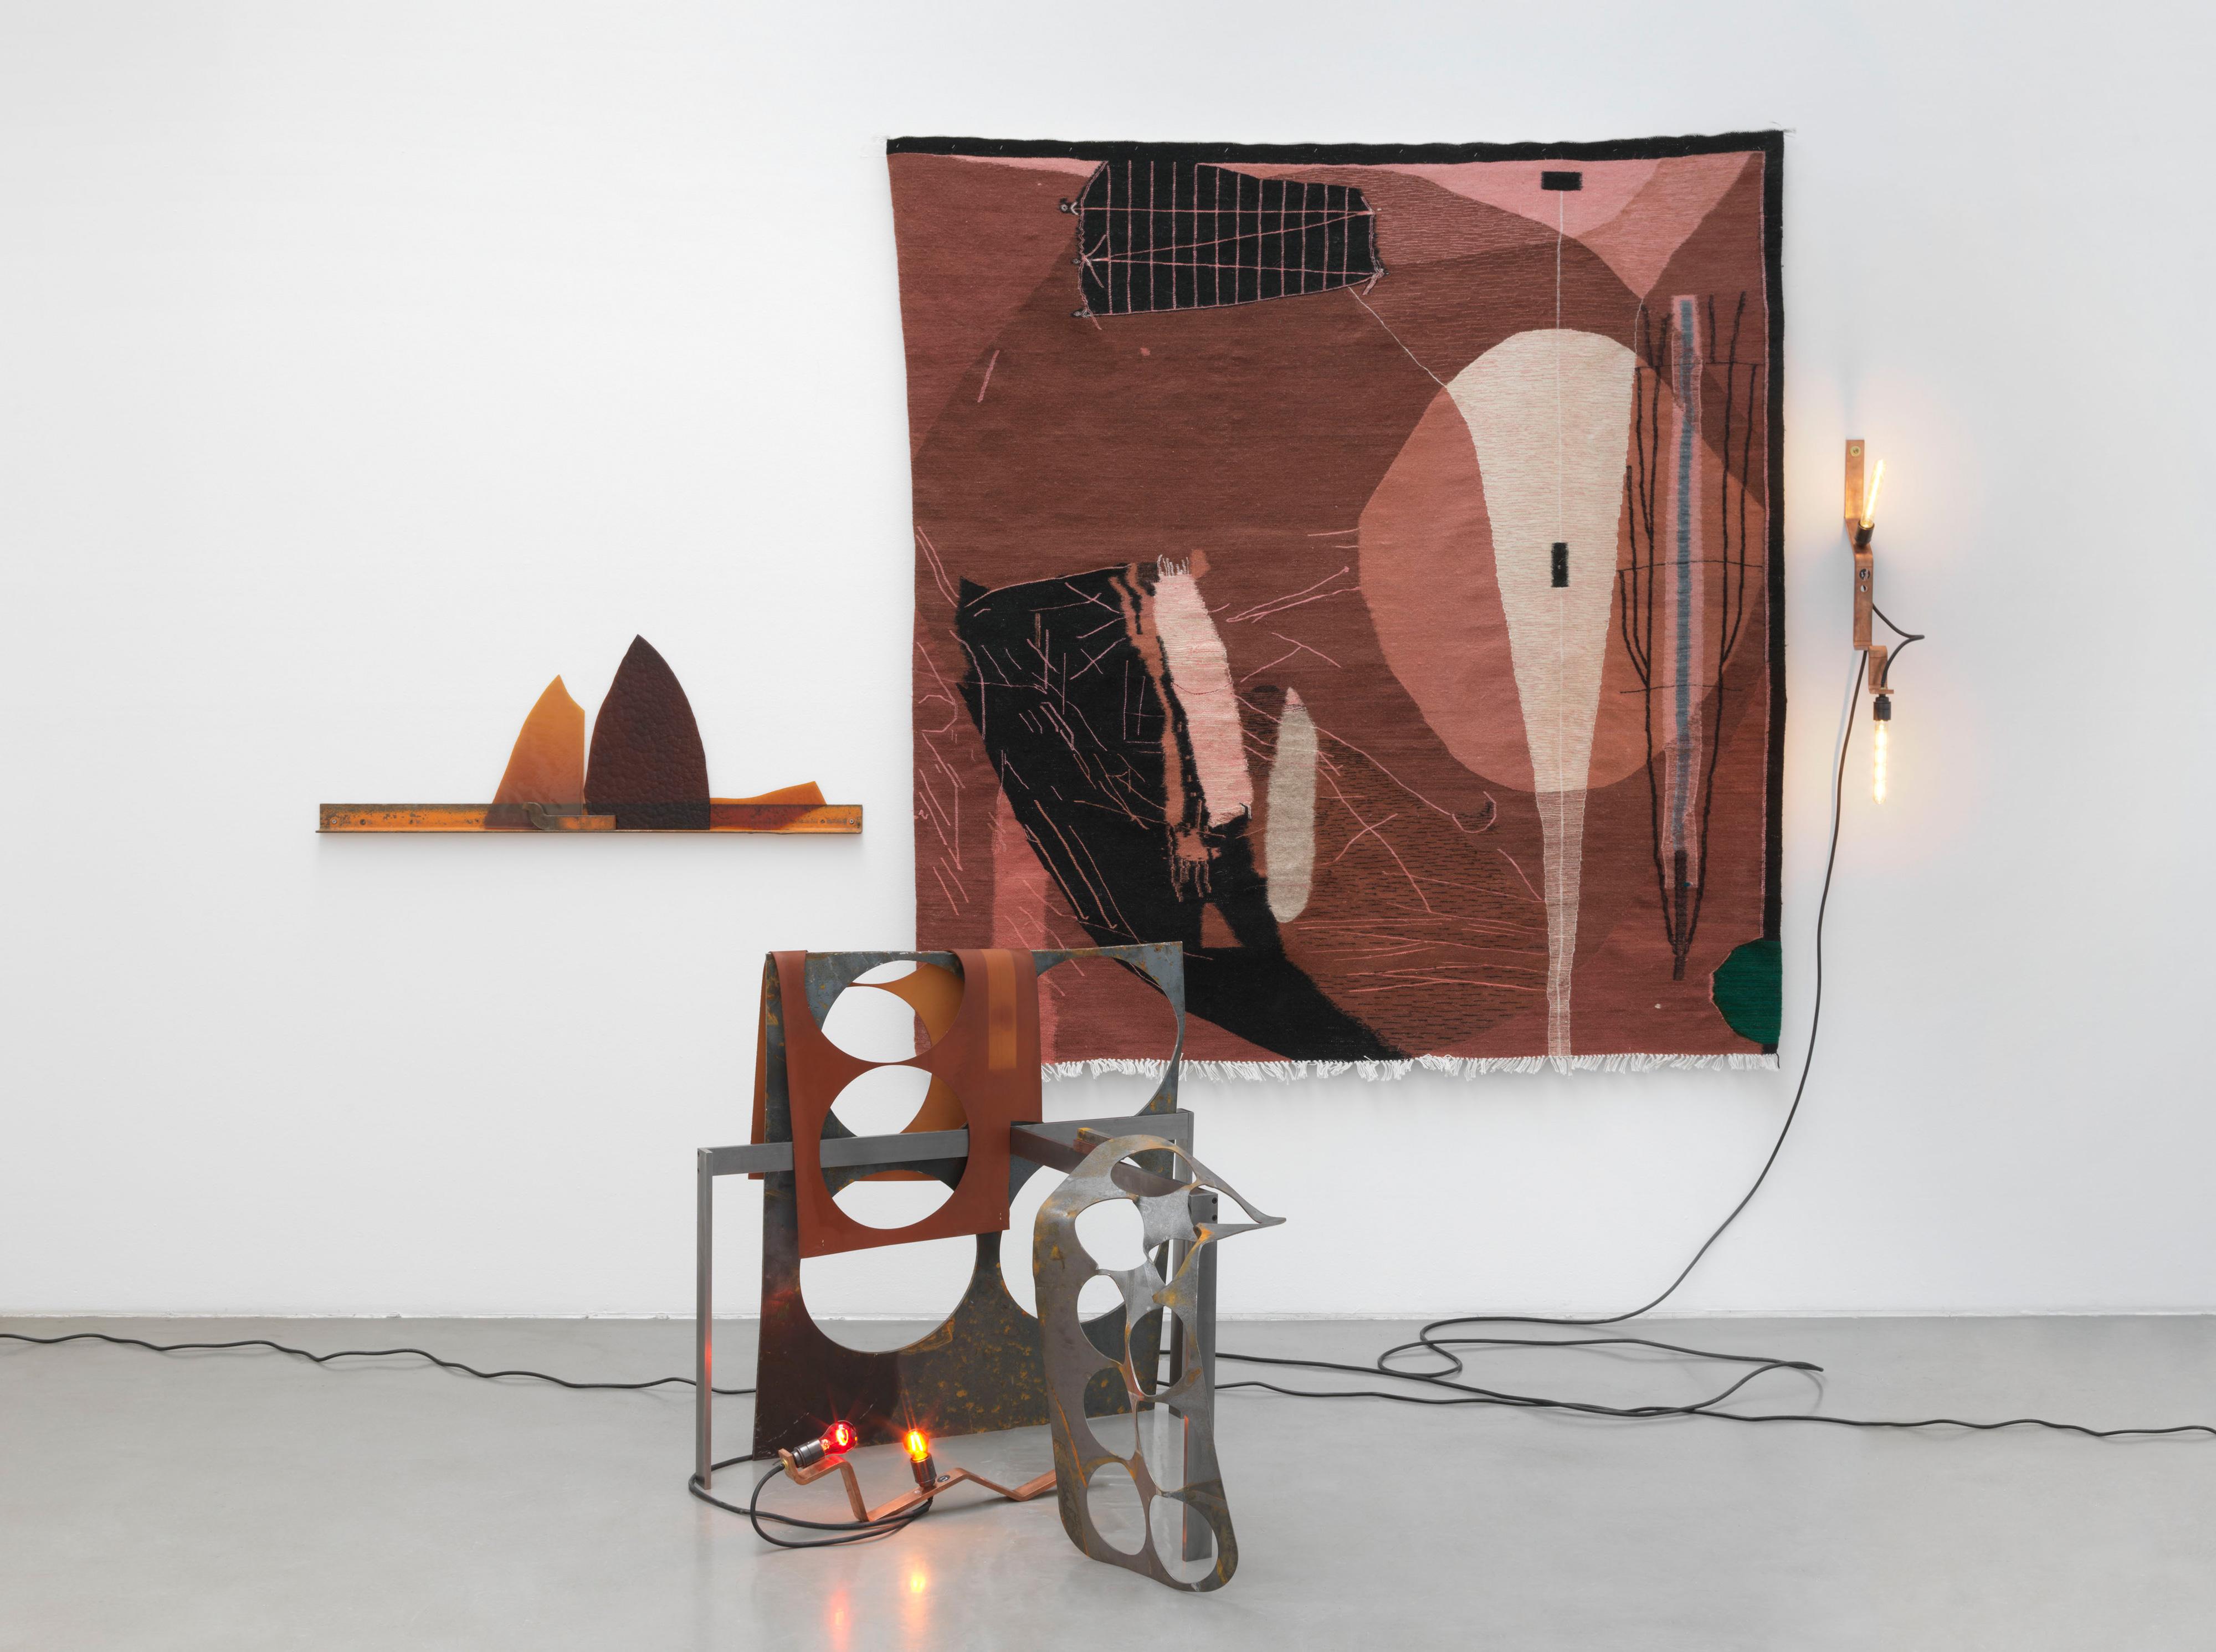 Galerie Barbara Thumm \ Sarah Entwistle: Many small carrots and frail sticks. (SEn-21-010) \ Many small carrots and frail sticks. (2021)